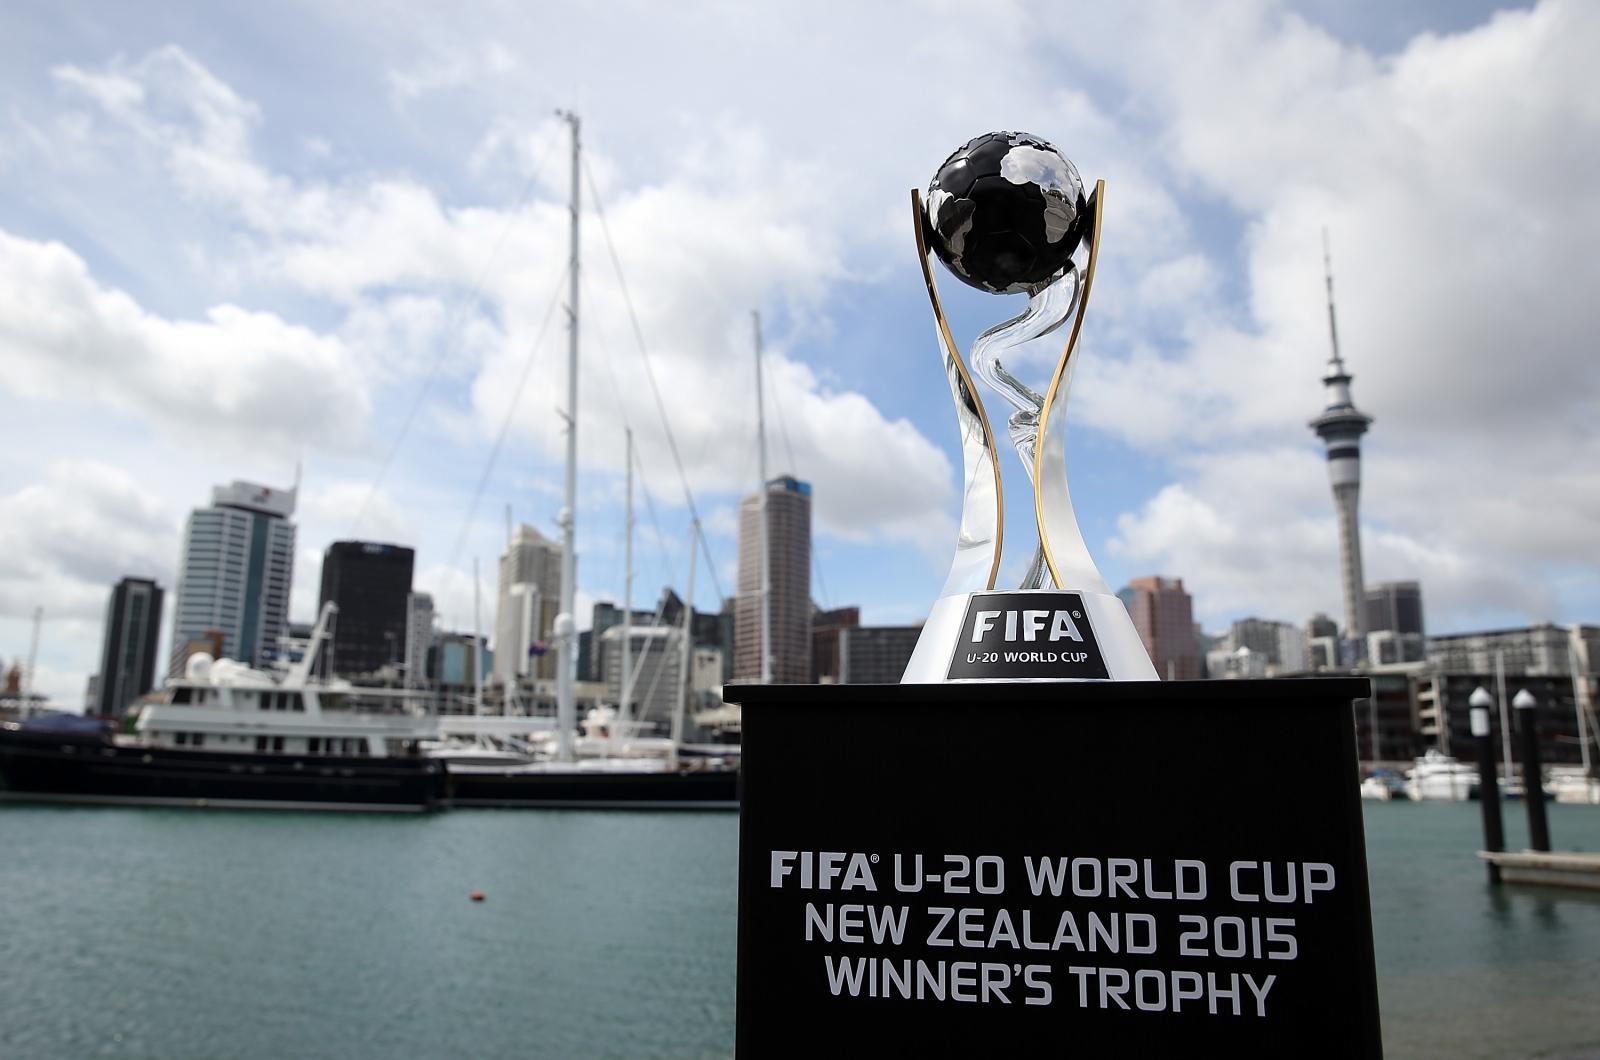 U20 World Cup